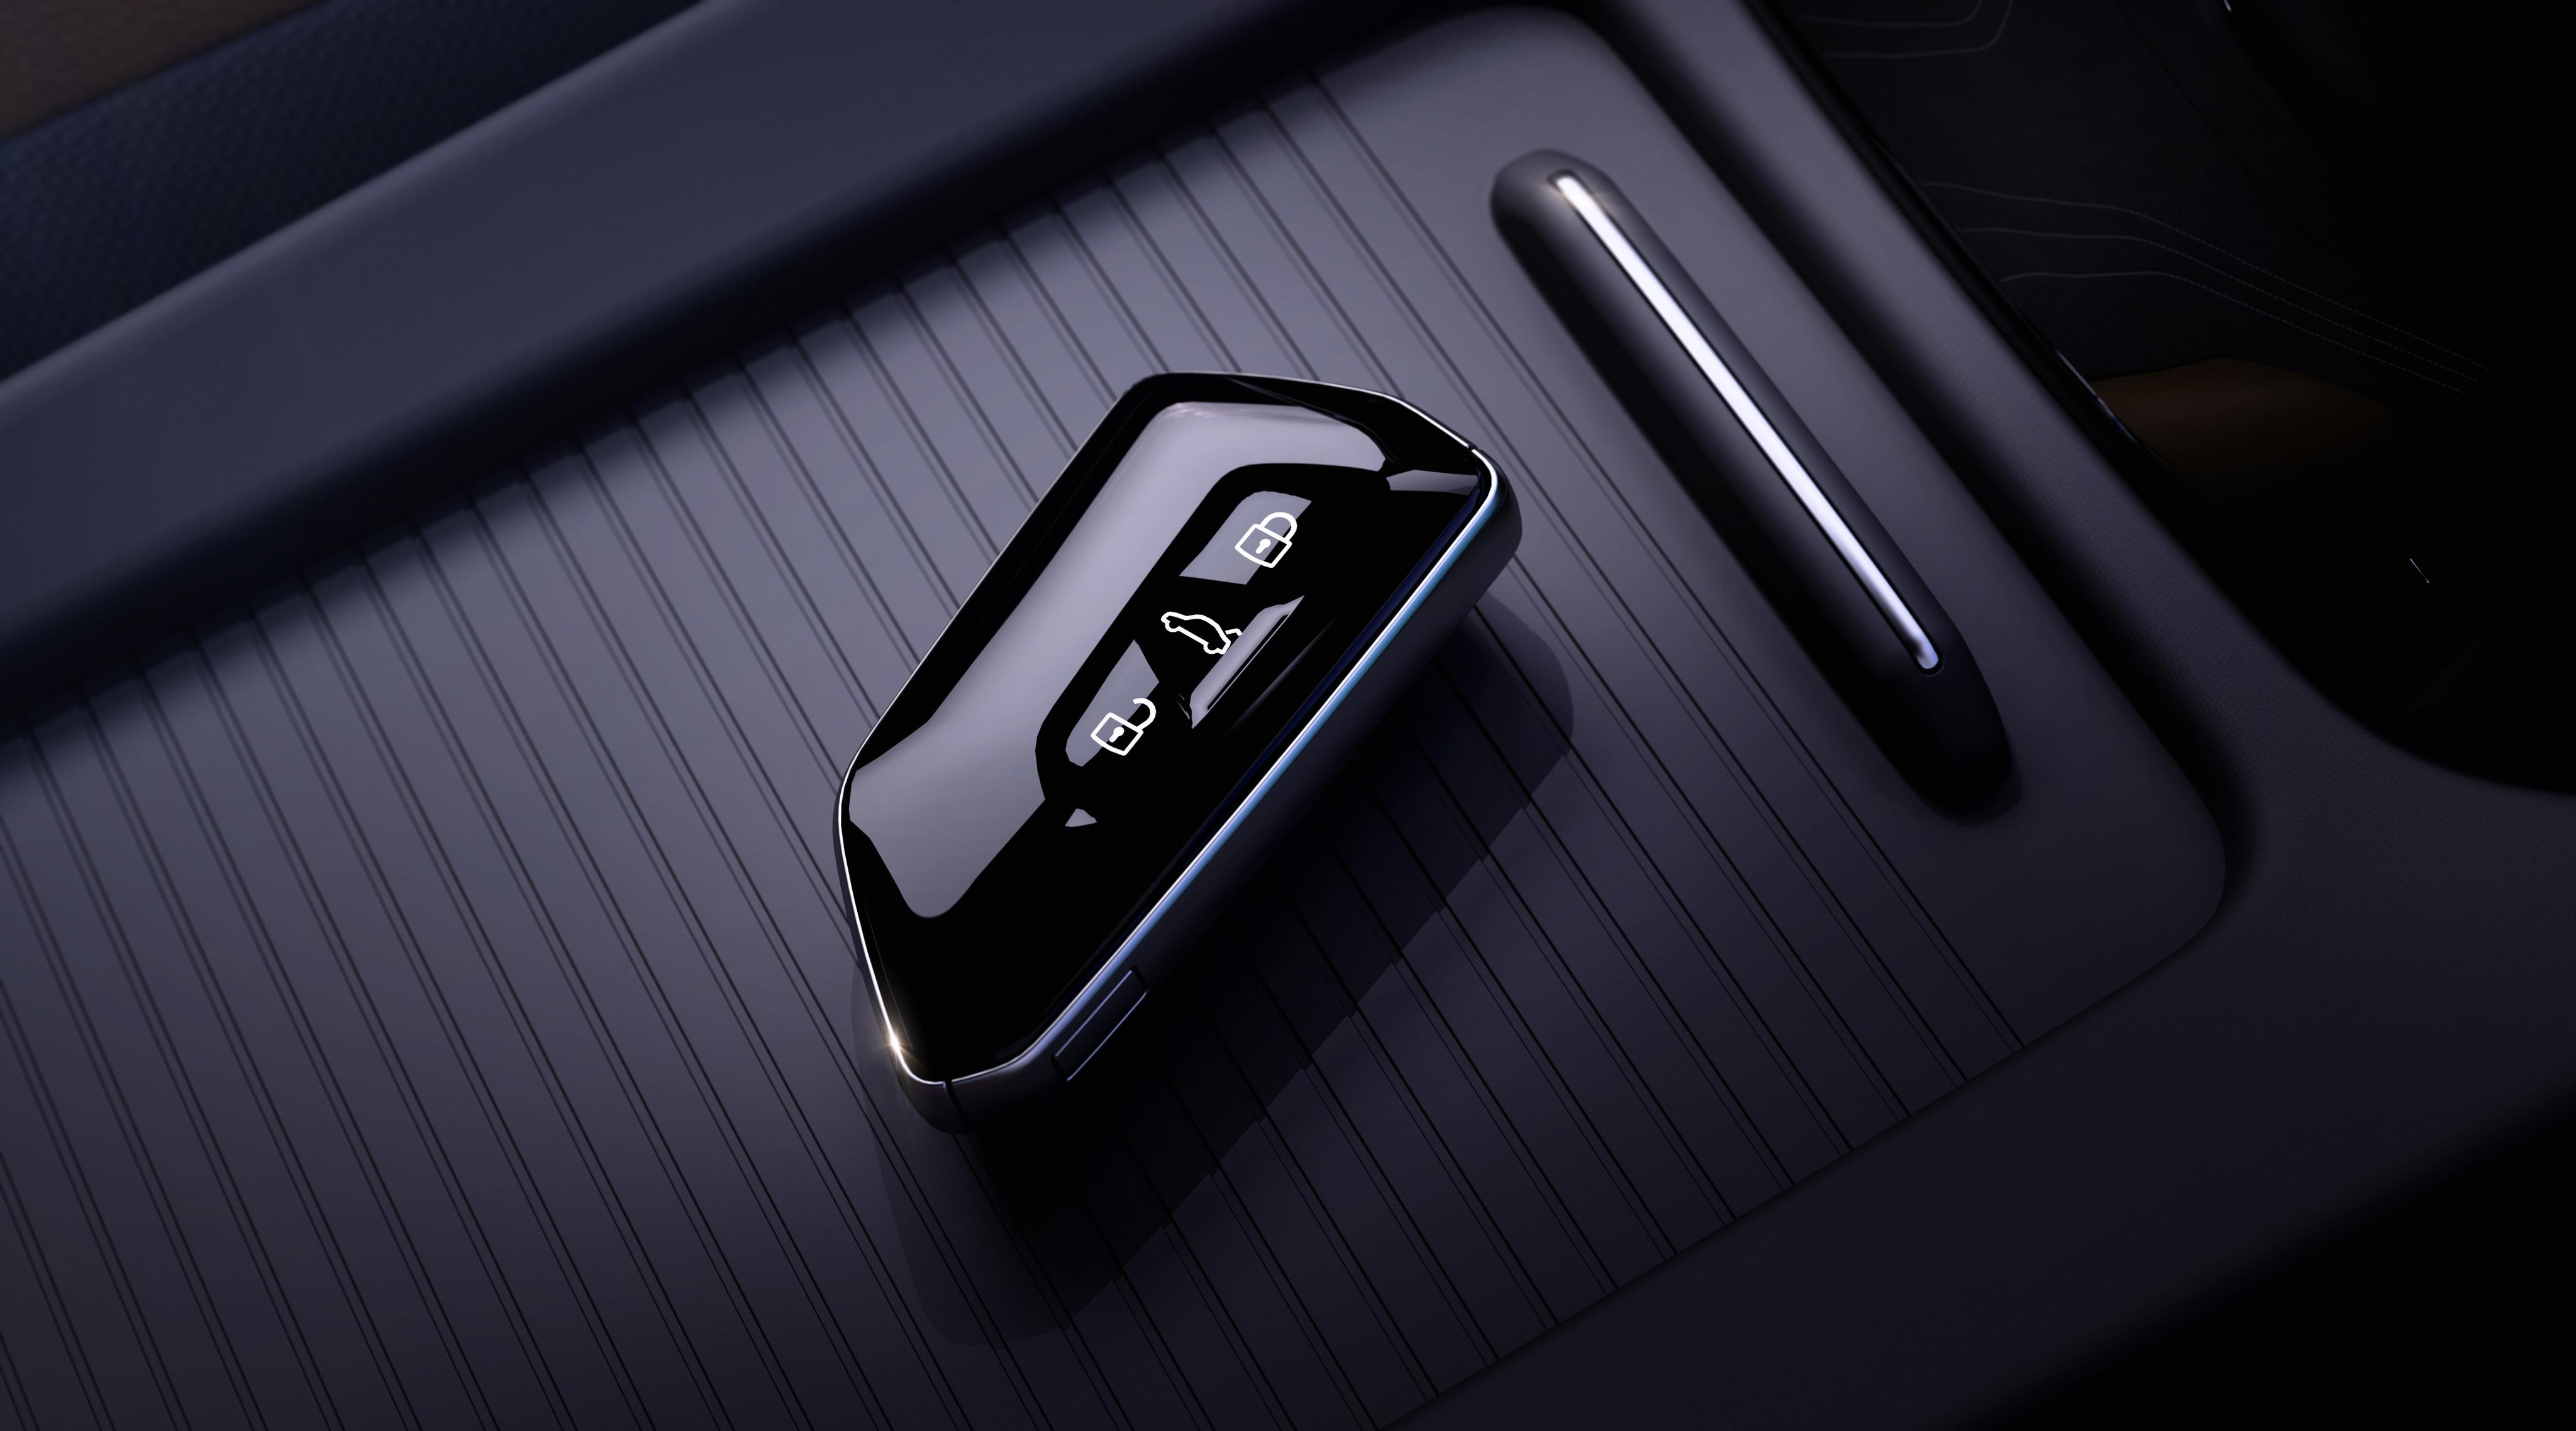 Volkswagen ID.4 key fob